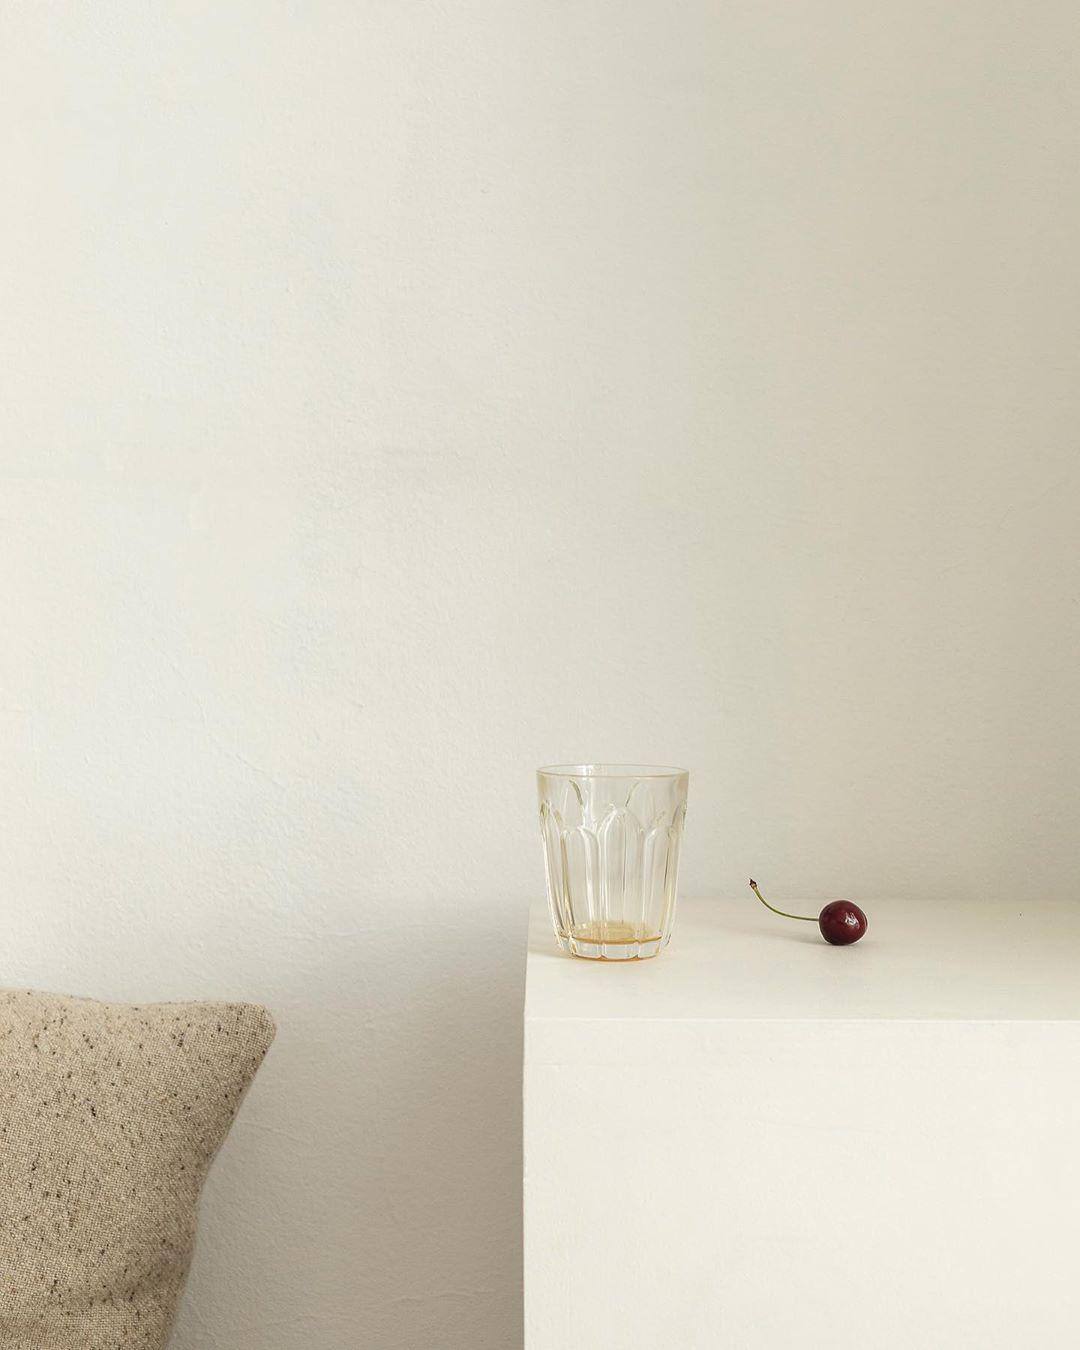 foto minimalista cu cirese